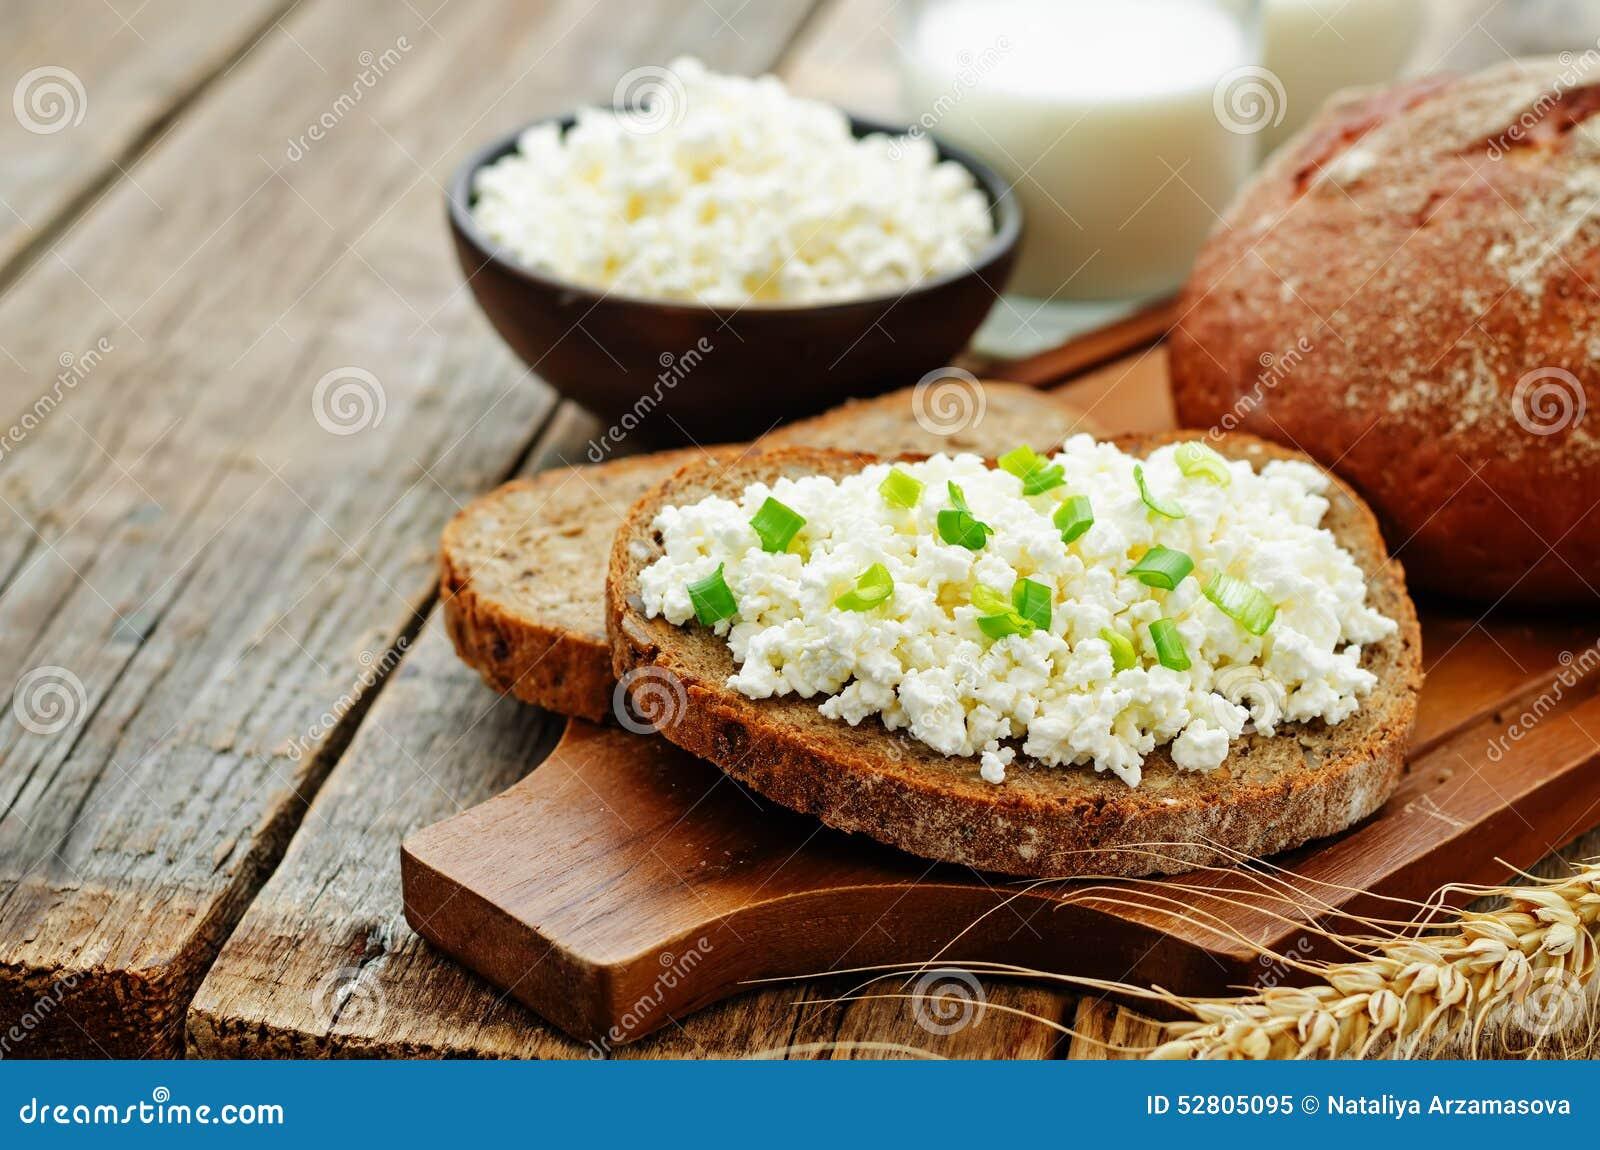 Healthy Breakfast With Whole Grain Rye Bread, Cottage ...